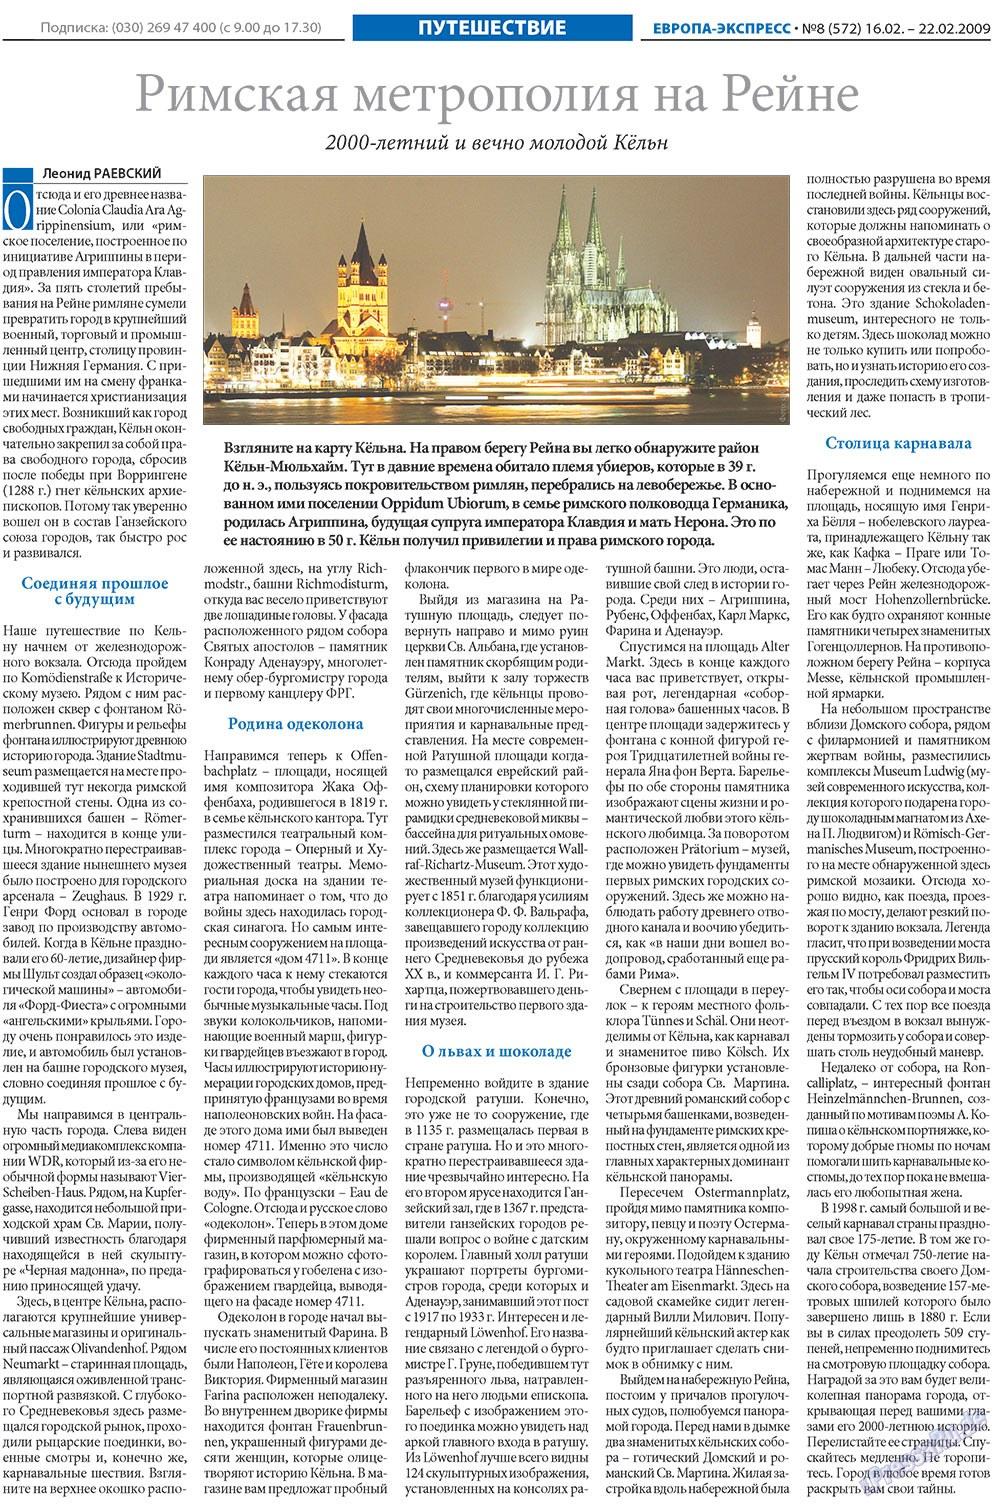 Европа экспресс (газета). 2009 год, номер 8, стр. 22